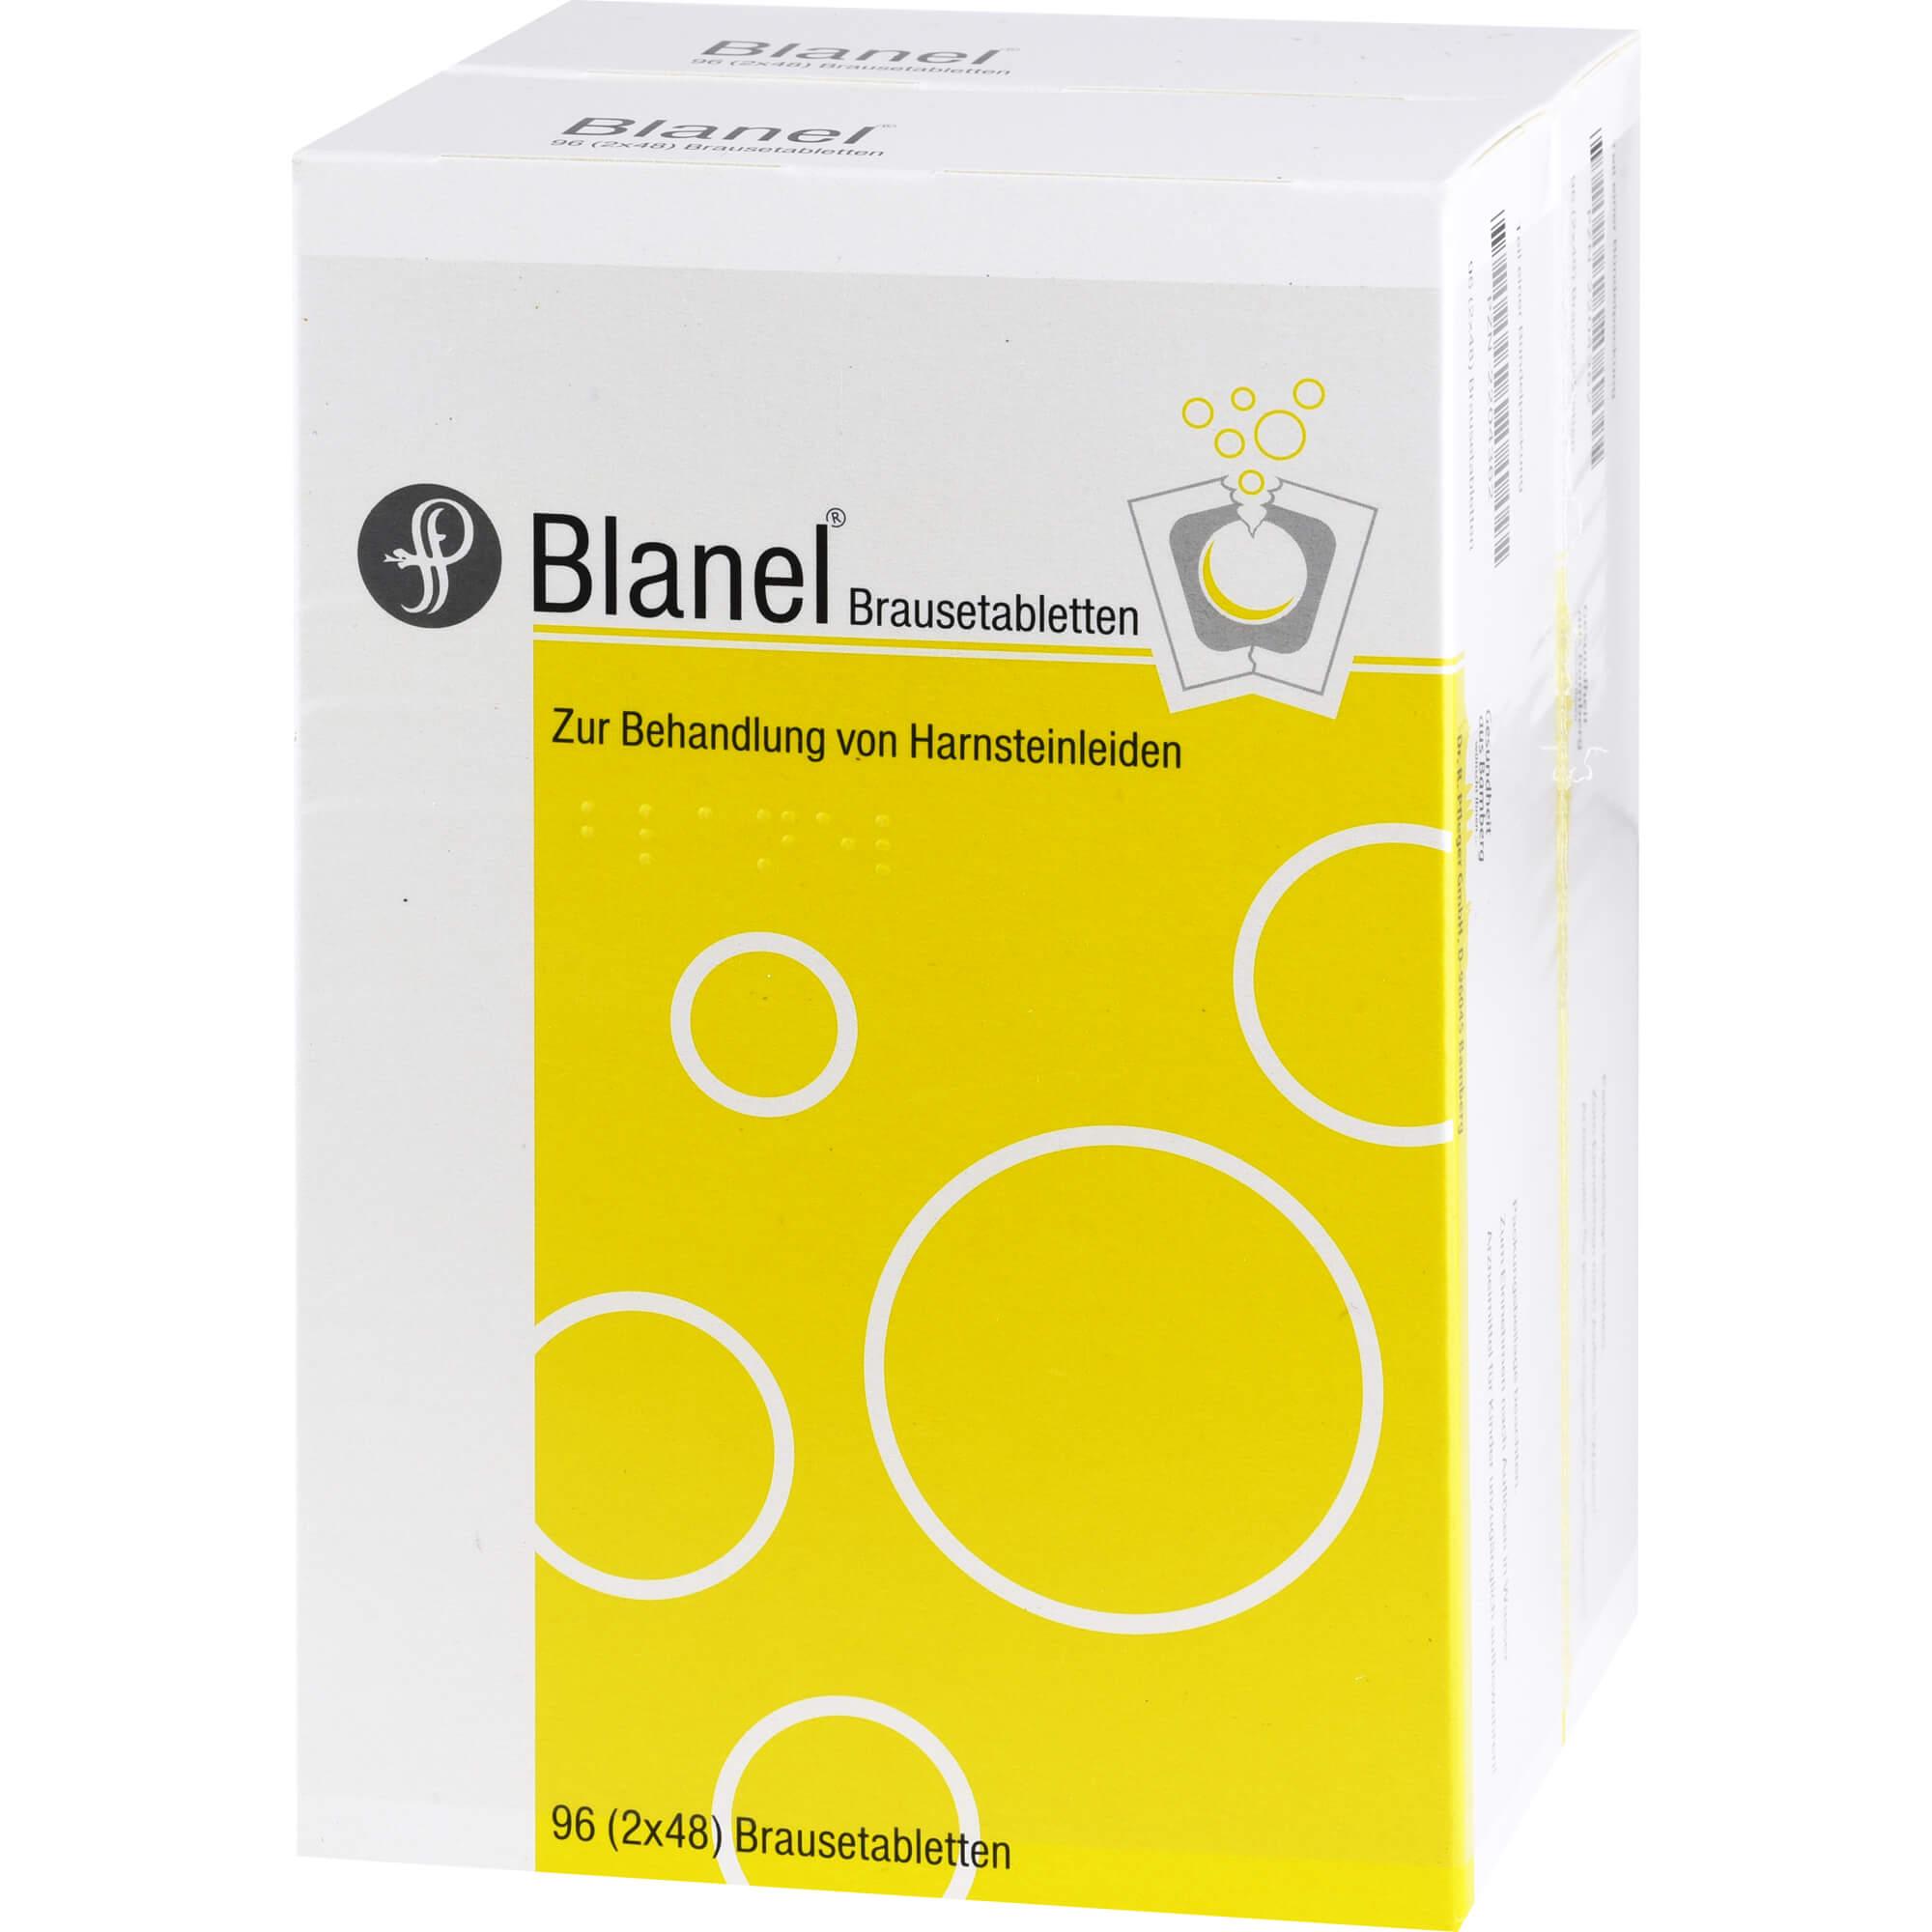 BLANEL Brausetabletten